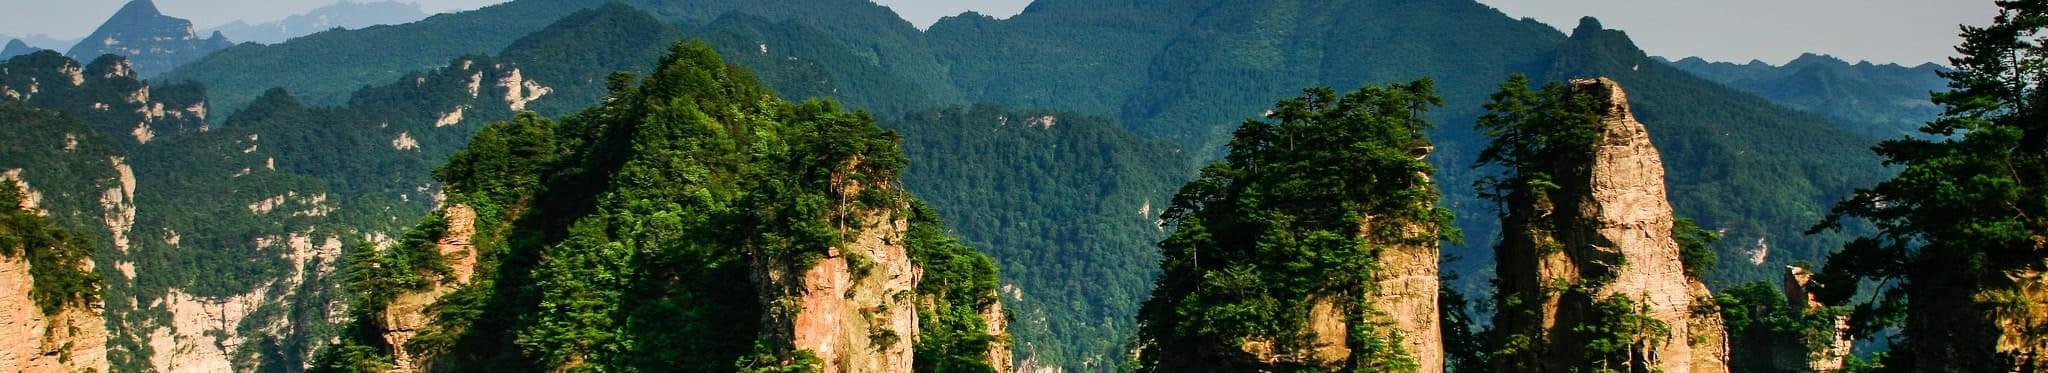 Легенда Желтого дракона <br> Пекин — Сиань — Чжанцзяцзе — Шанхай <br> 2019 год